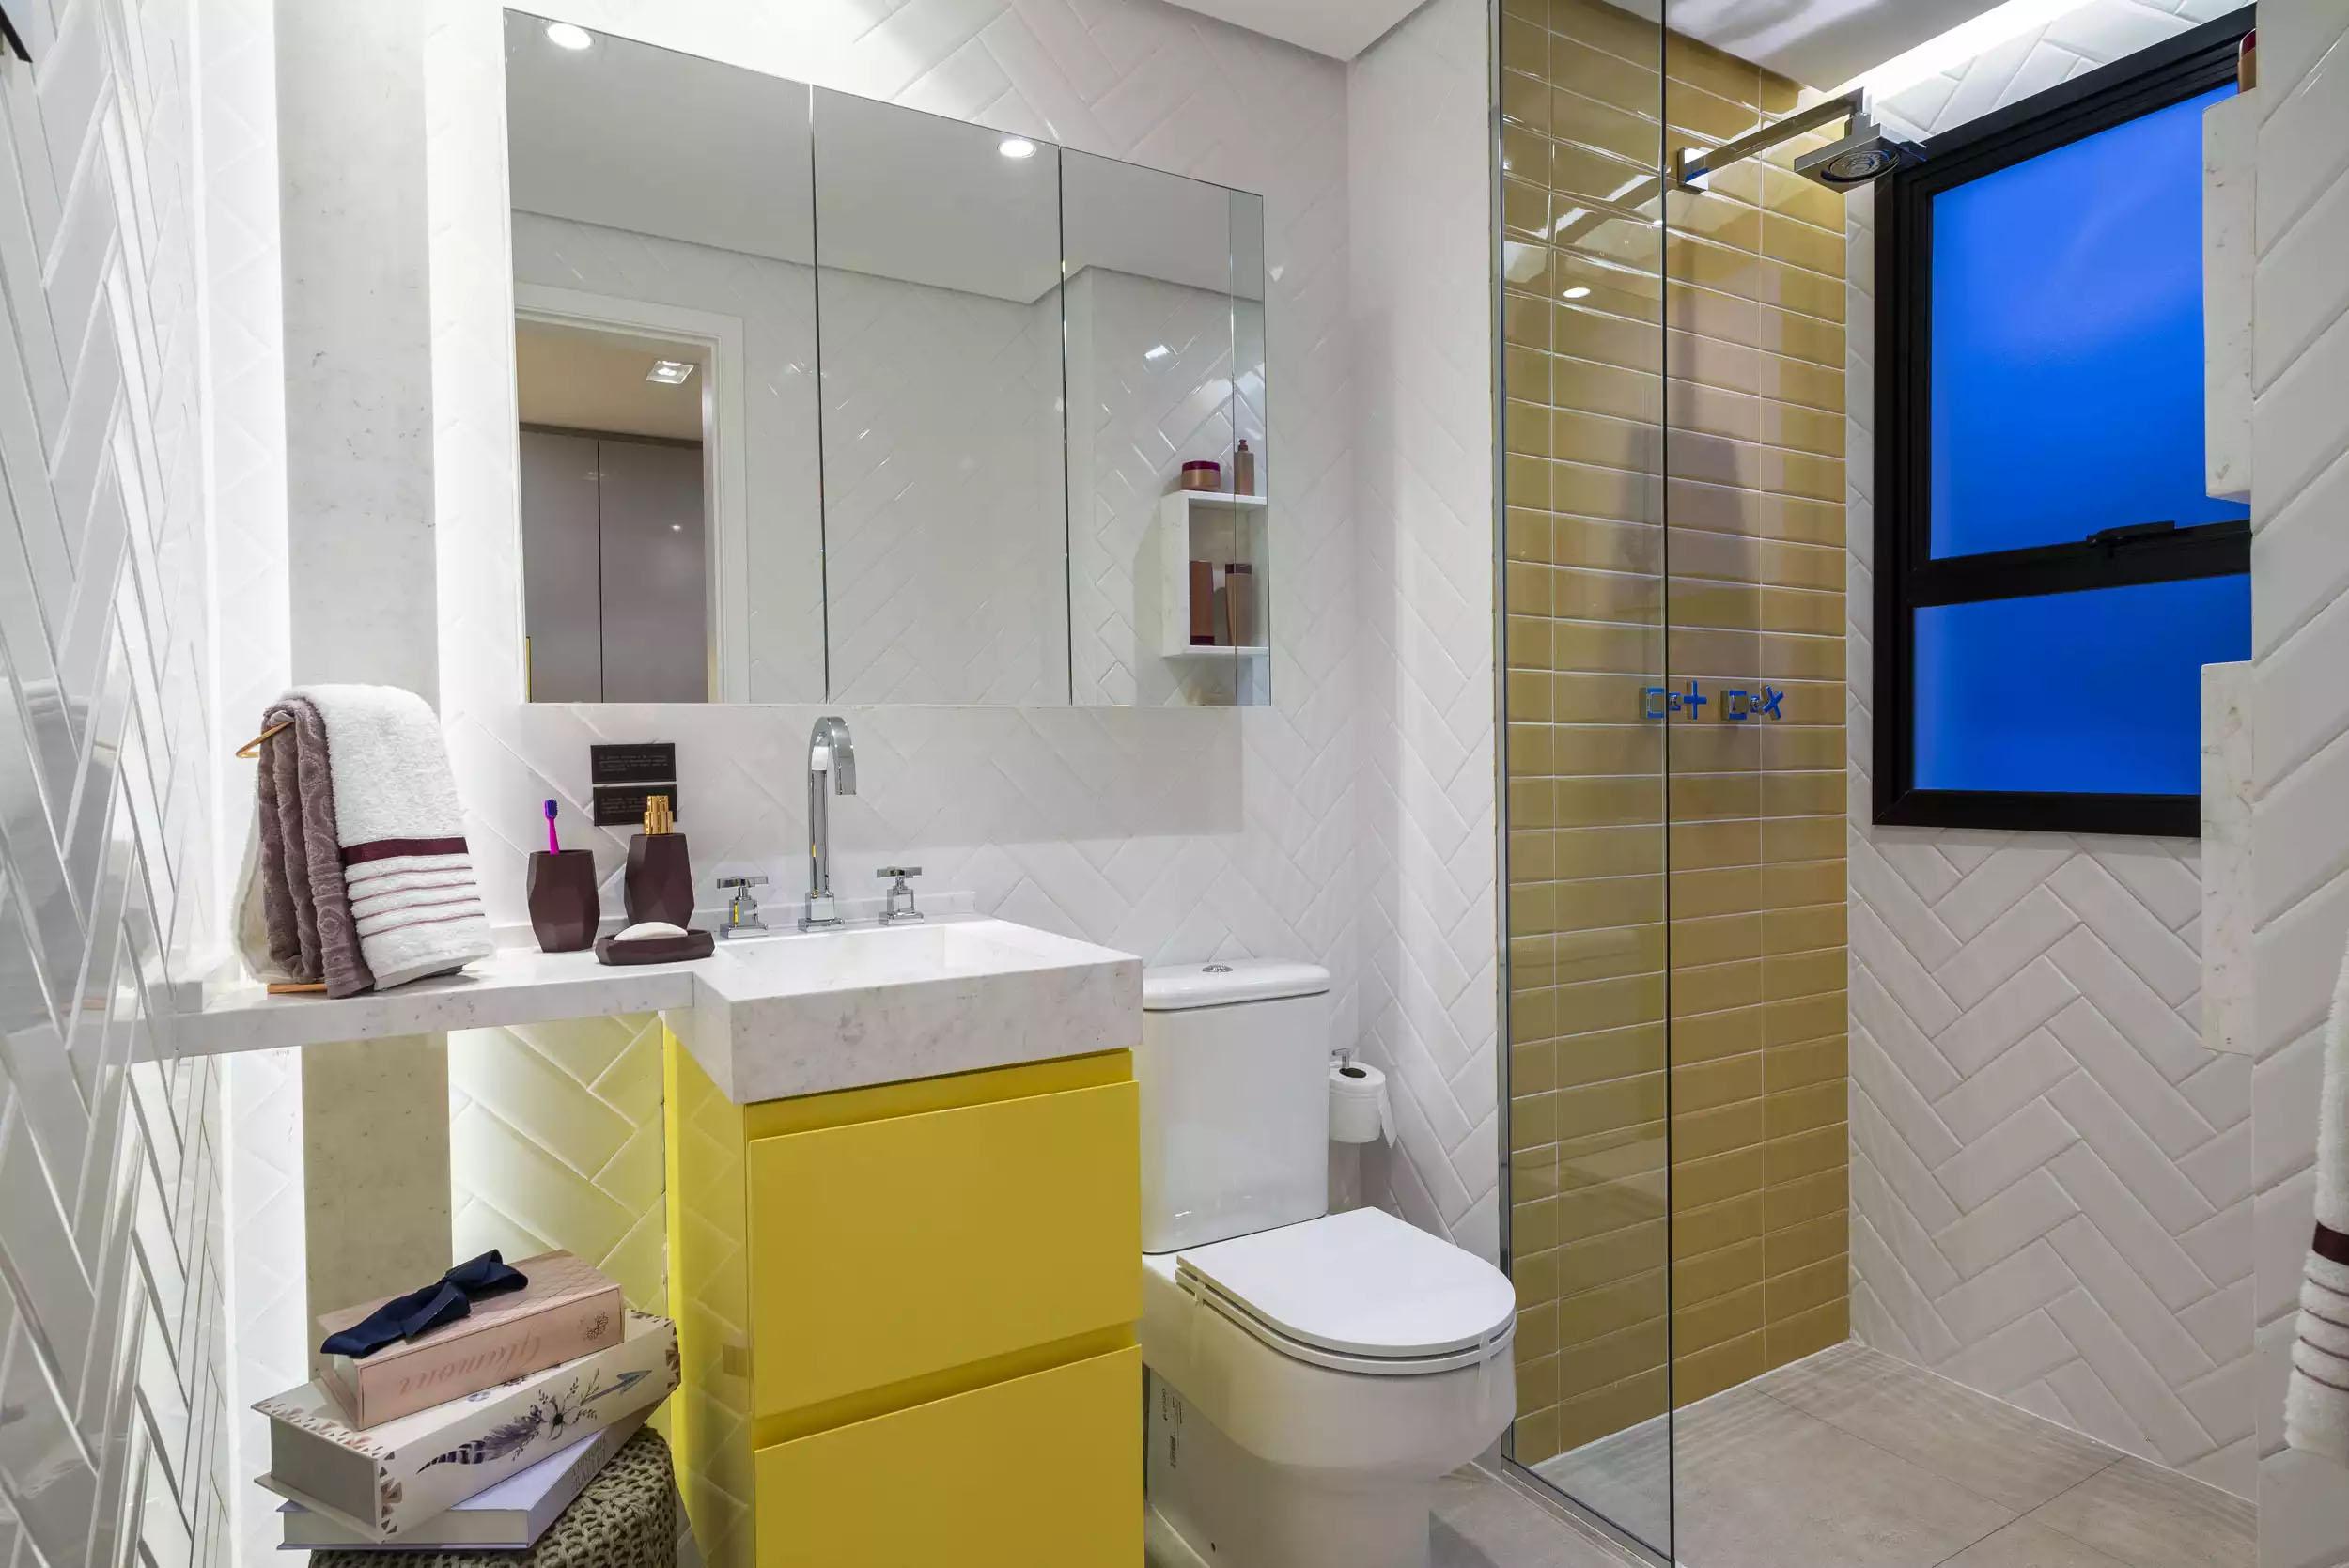 Decorado - Banheiro 3 1300 Jurupis